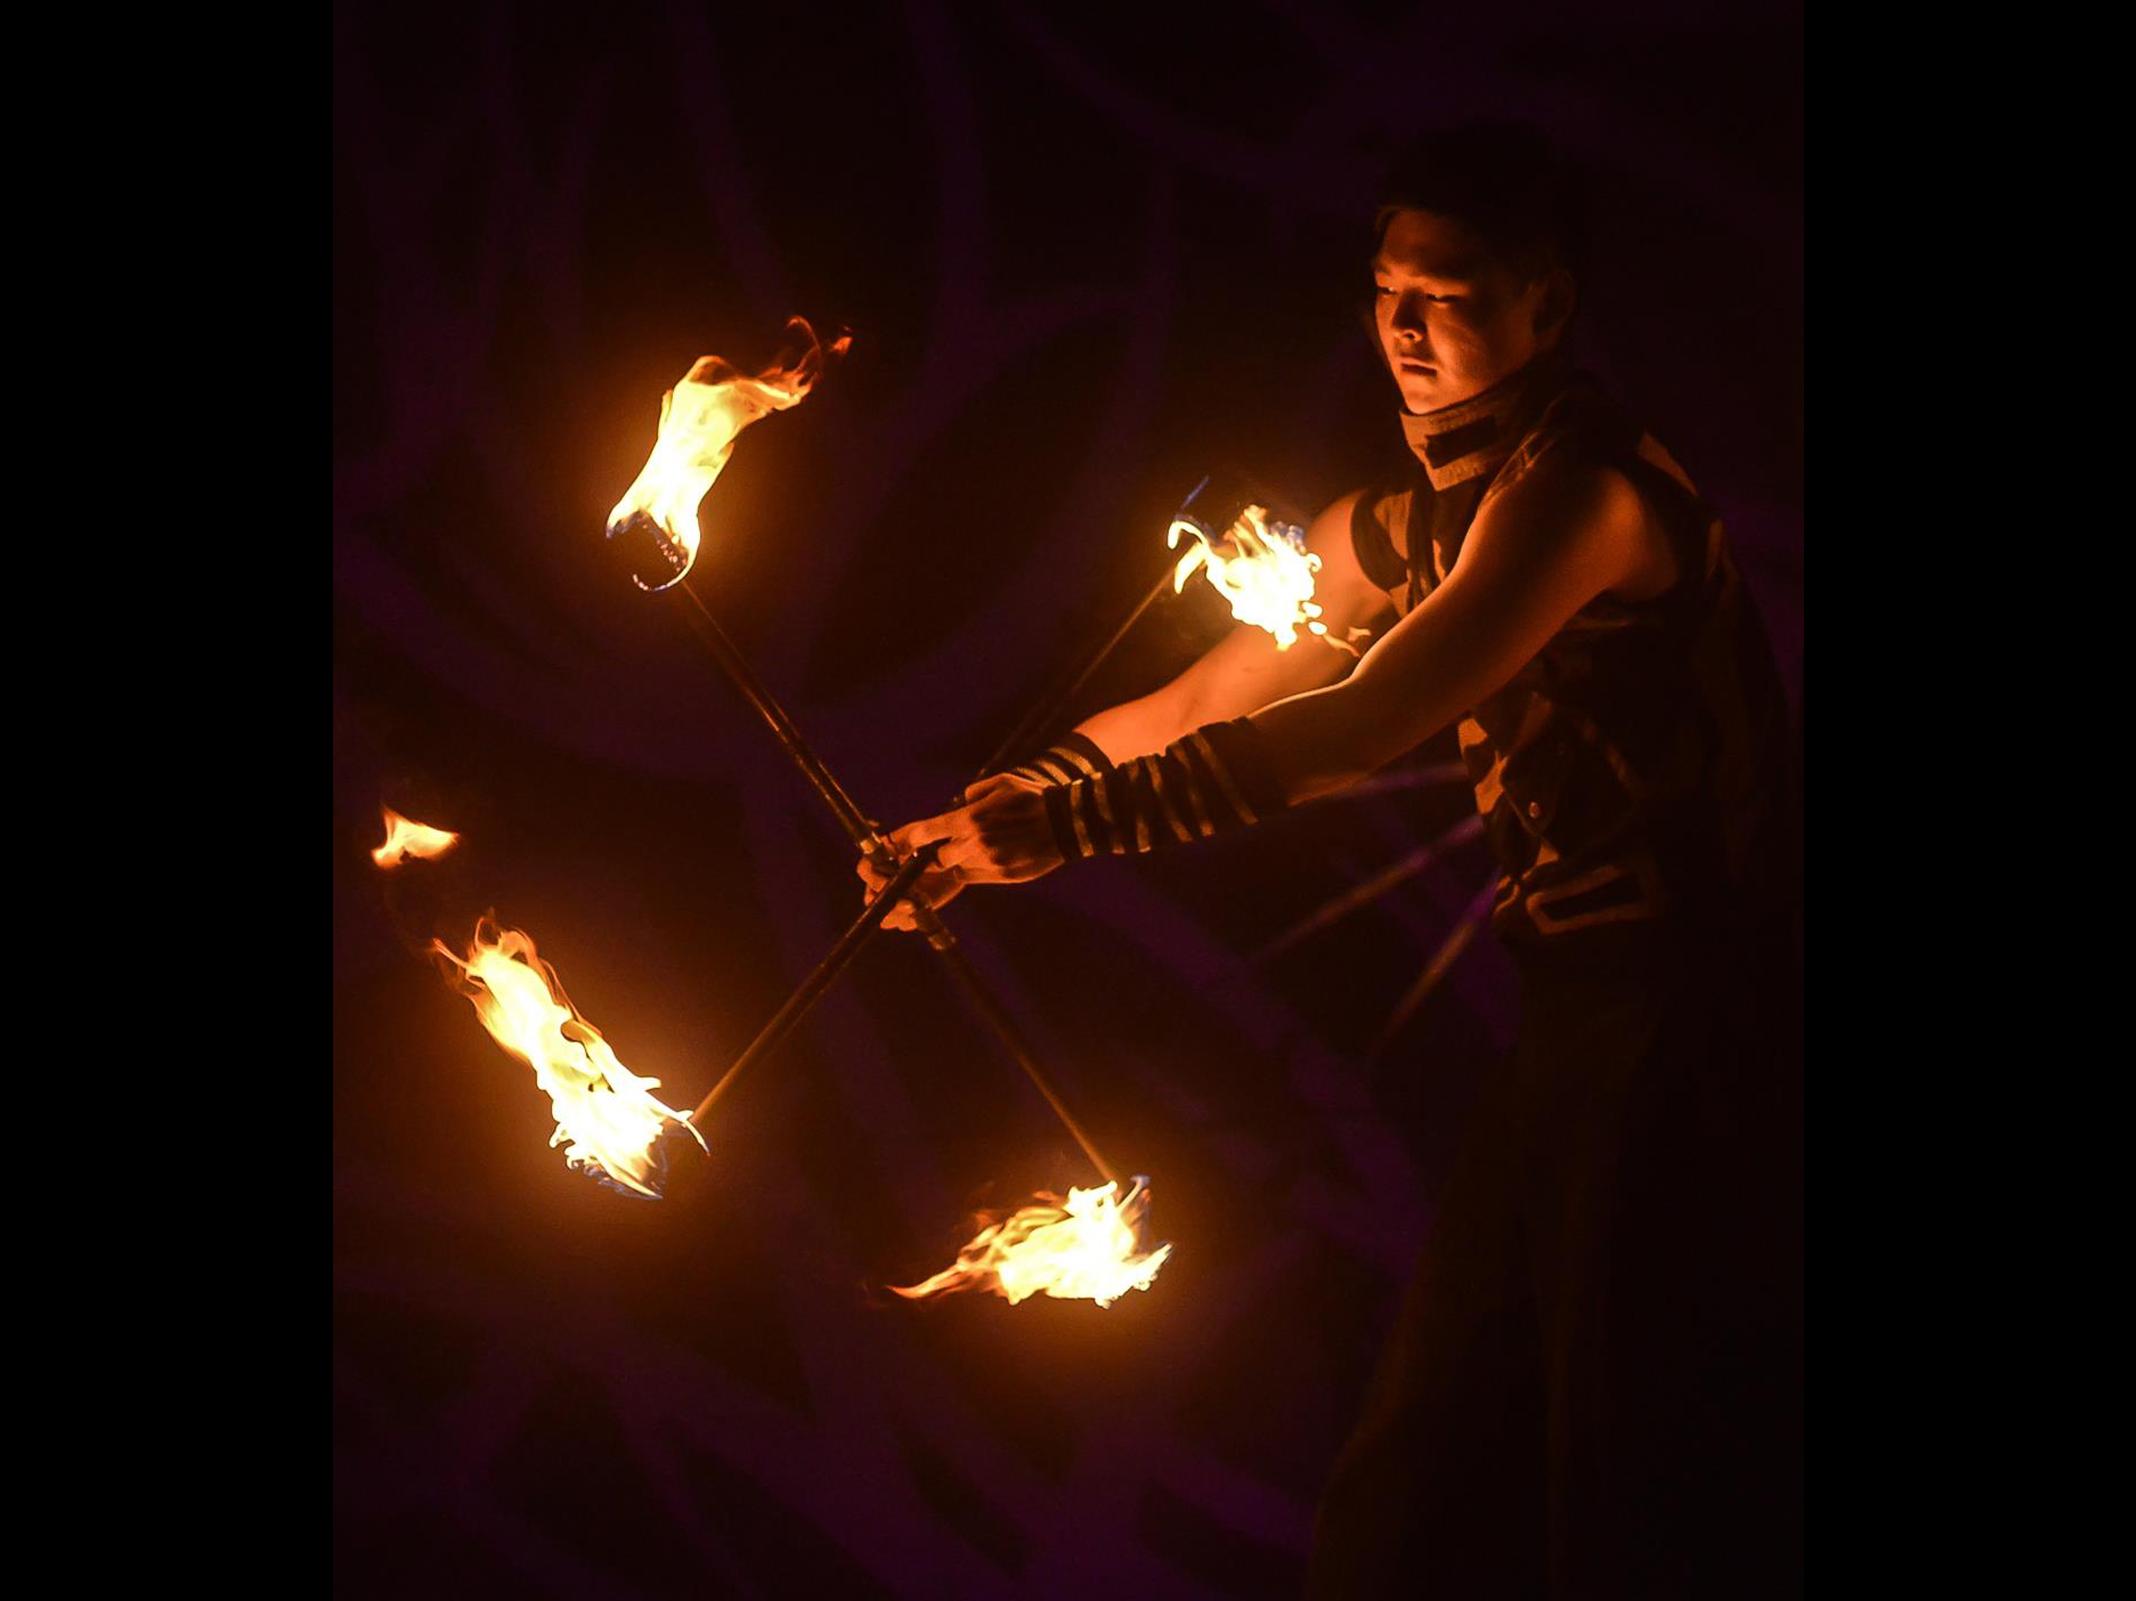 Fire Arts_Flaming Fire team_hunyflow (3)